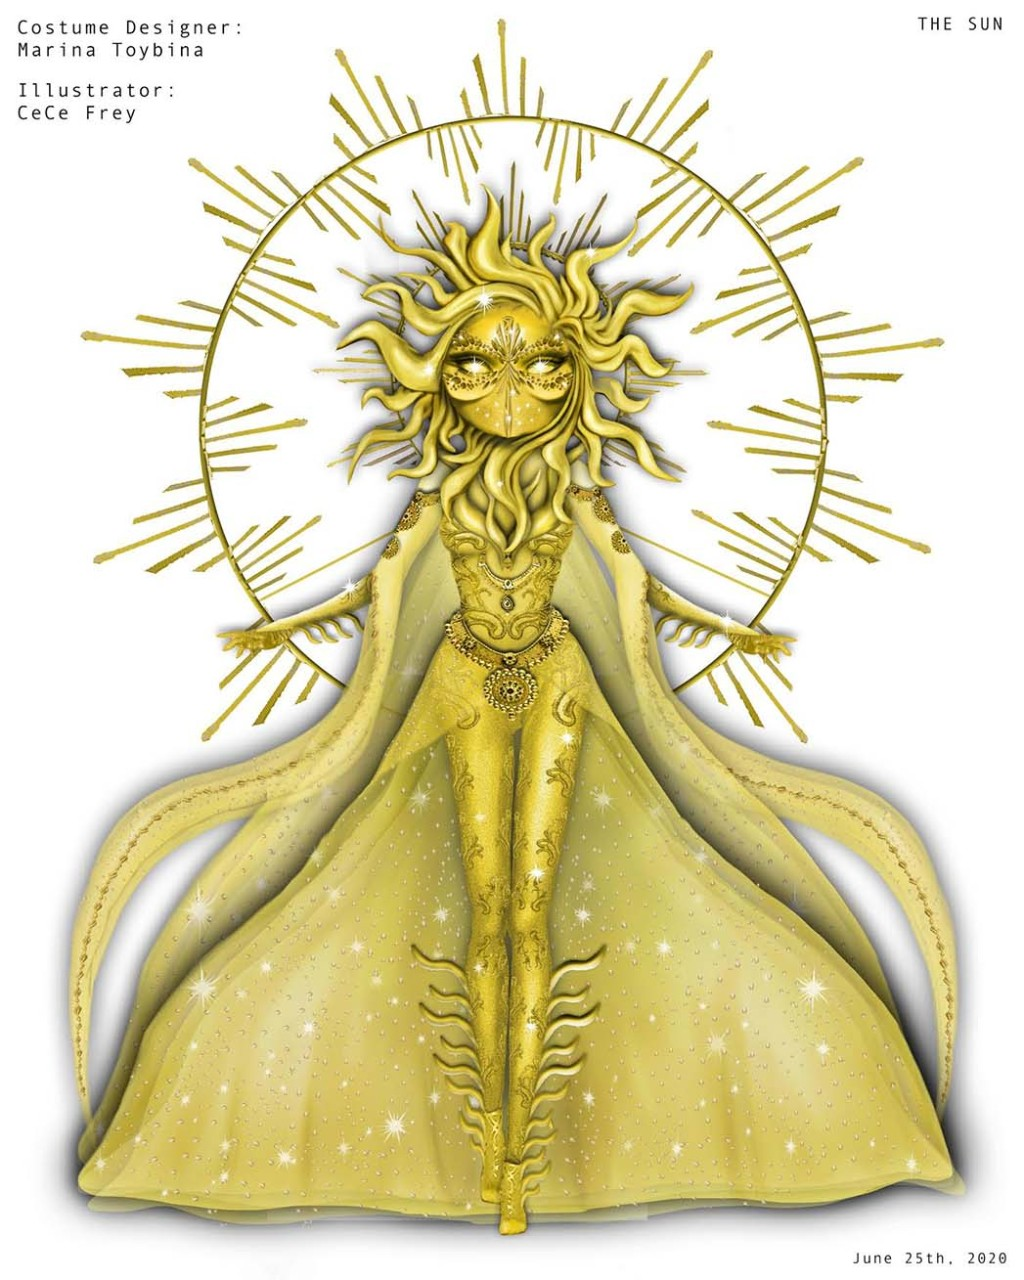 Sketch by illustrator CeCe Frey of costume designer Marina Toybina's design for The Sun on The Masked Singer .